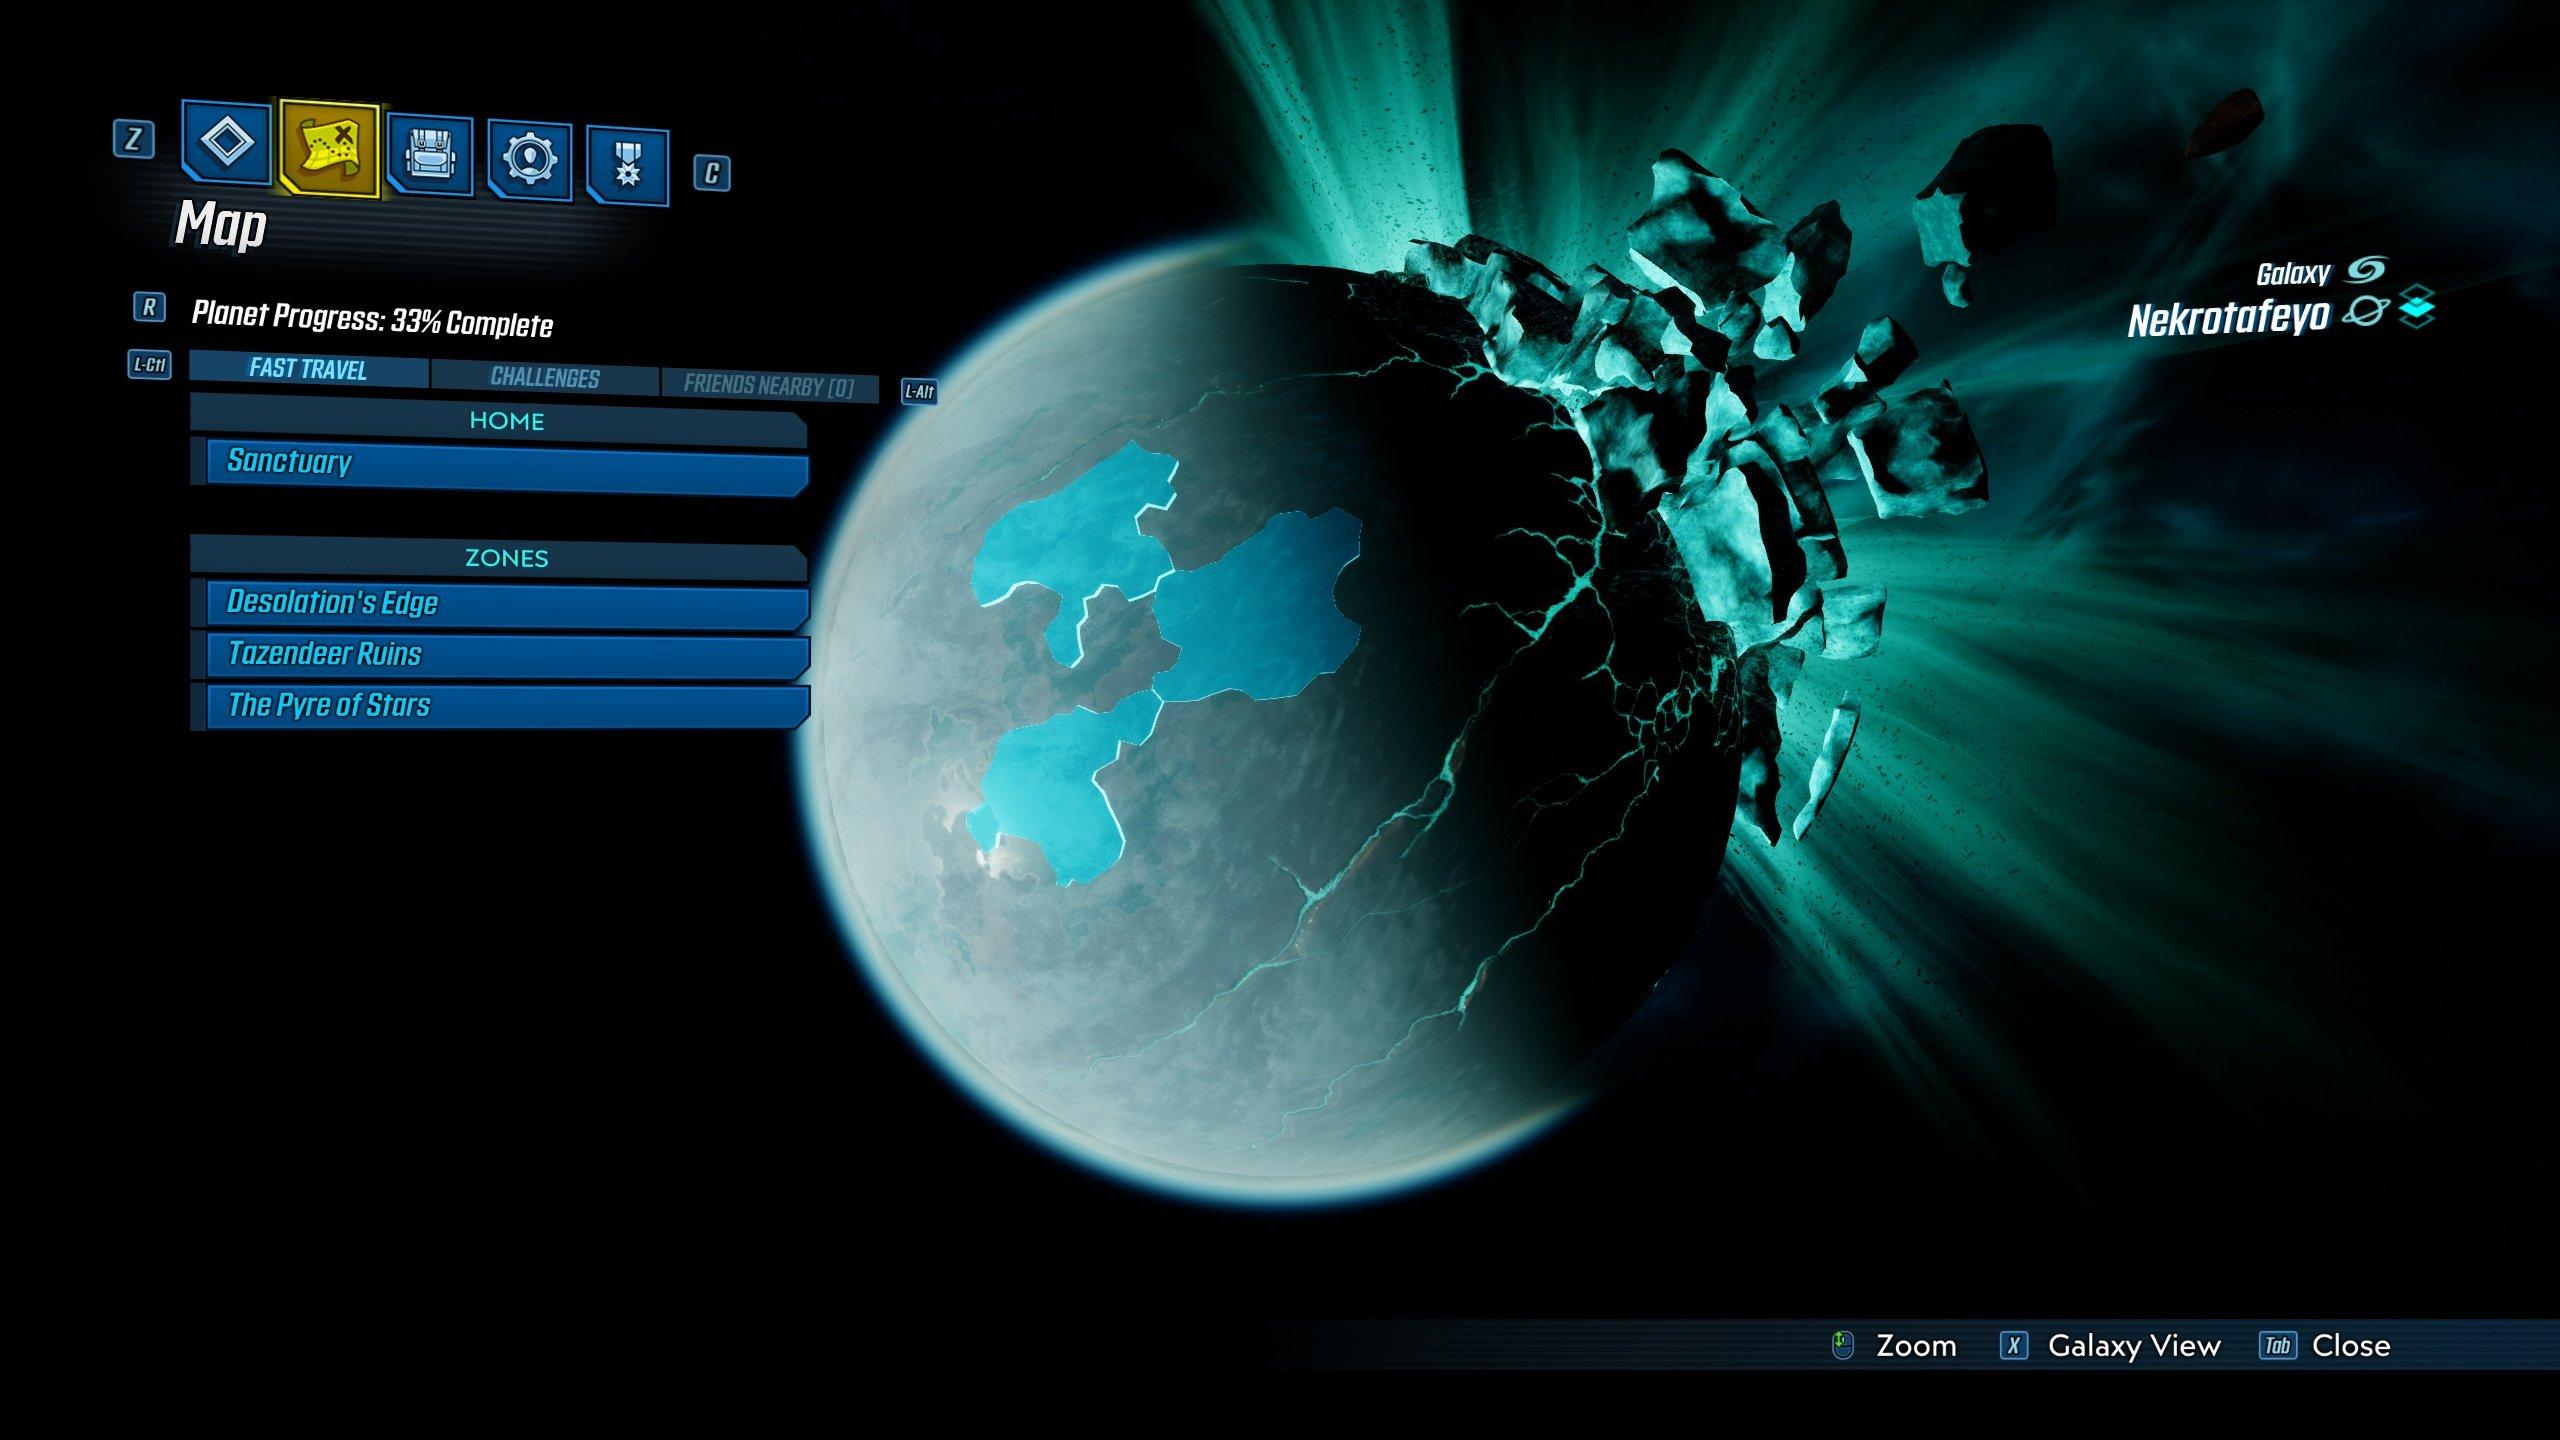 Borderlands 3 Nekrotafeyo side missions